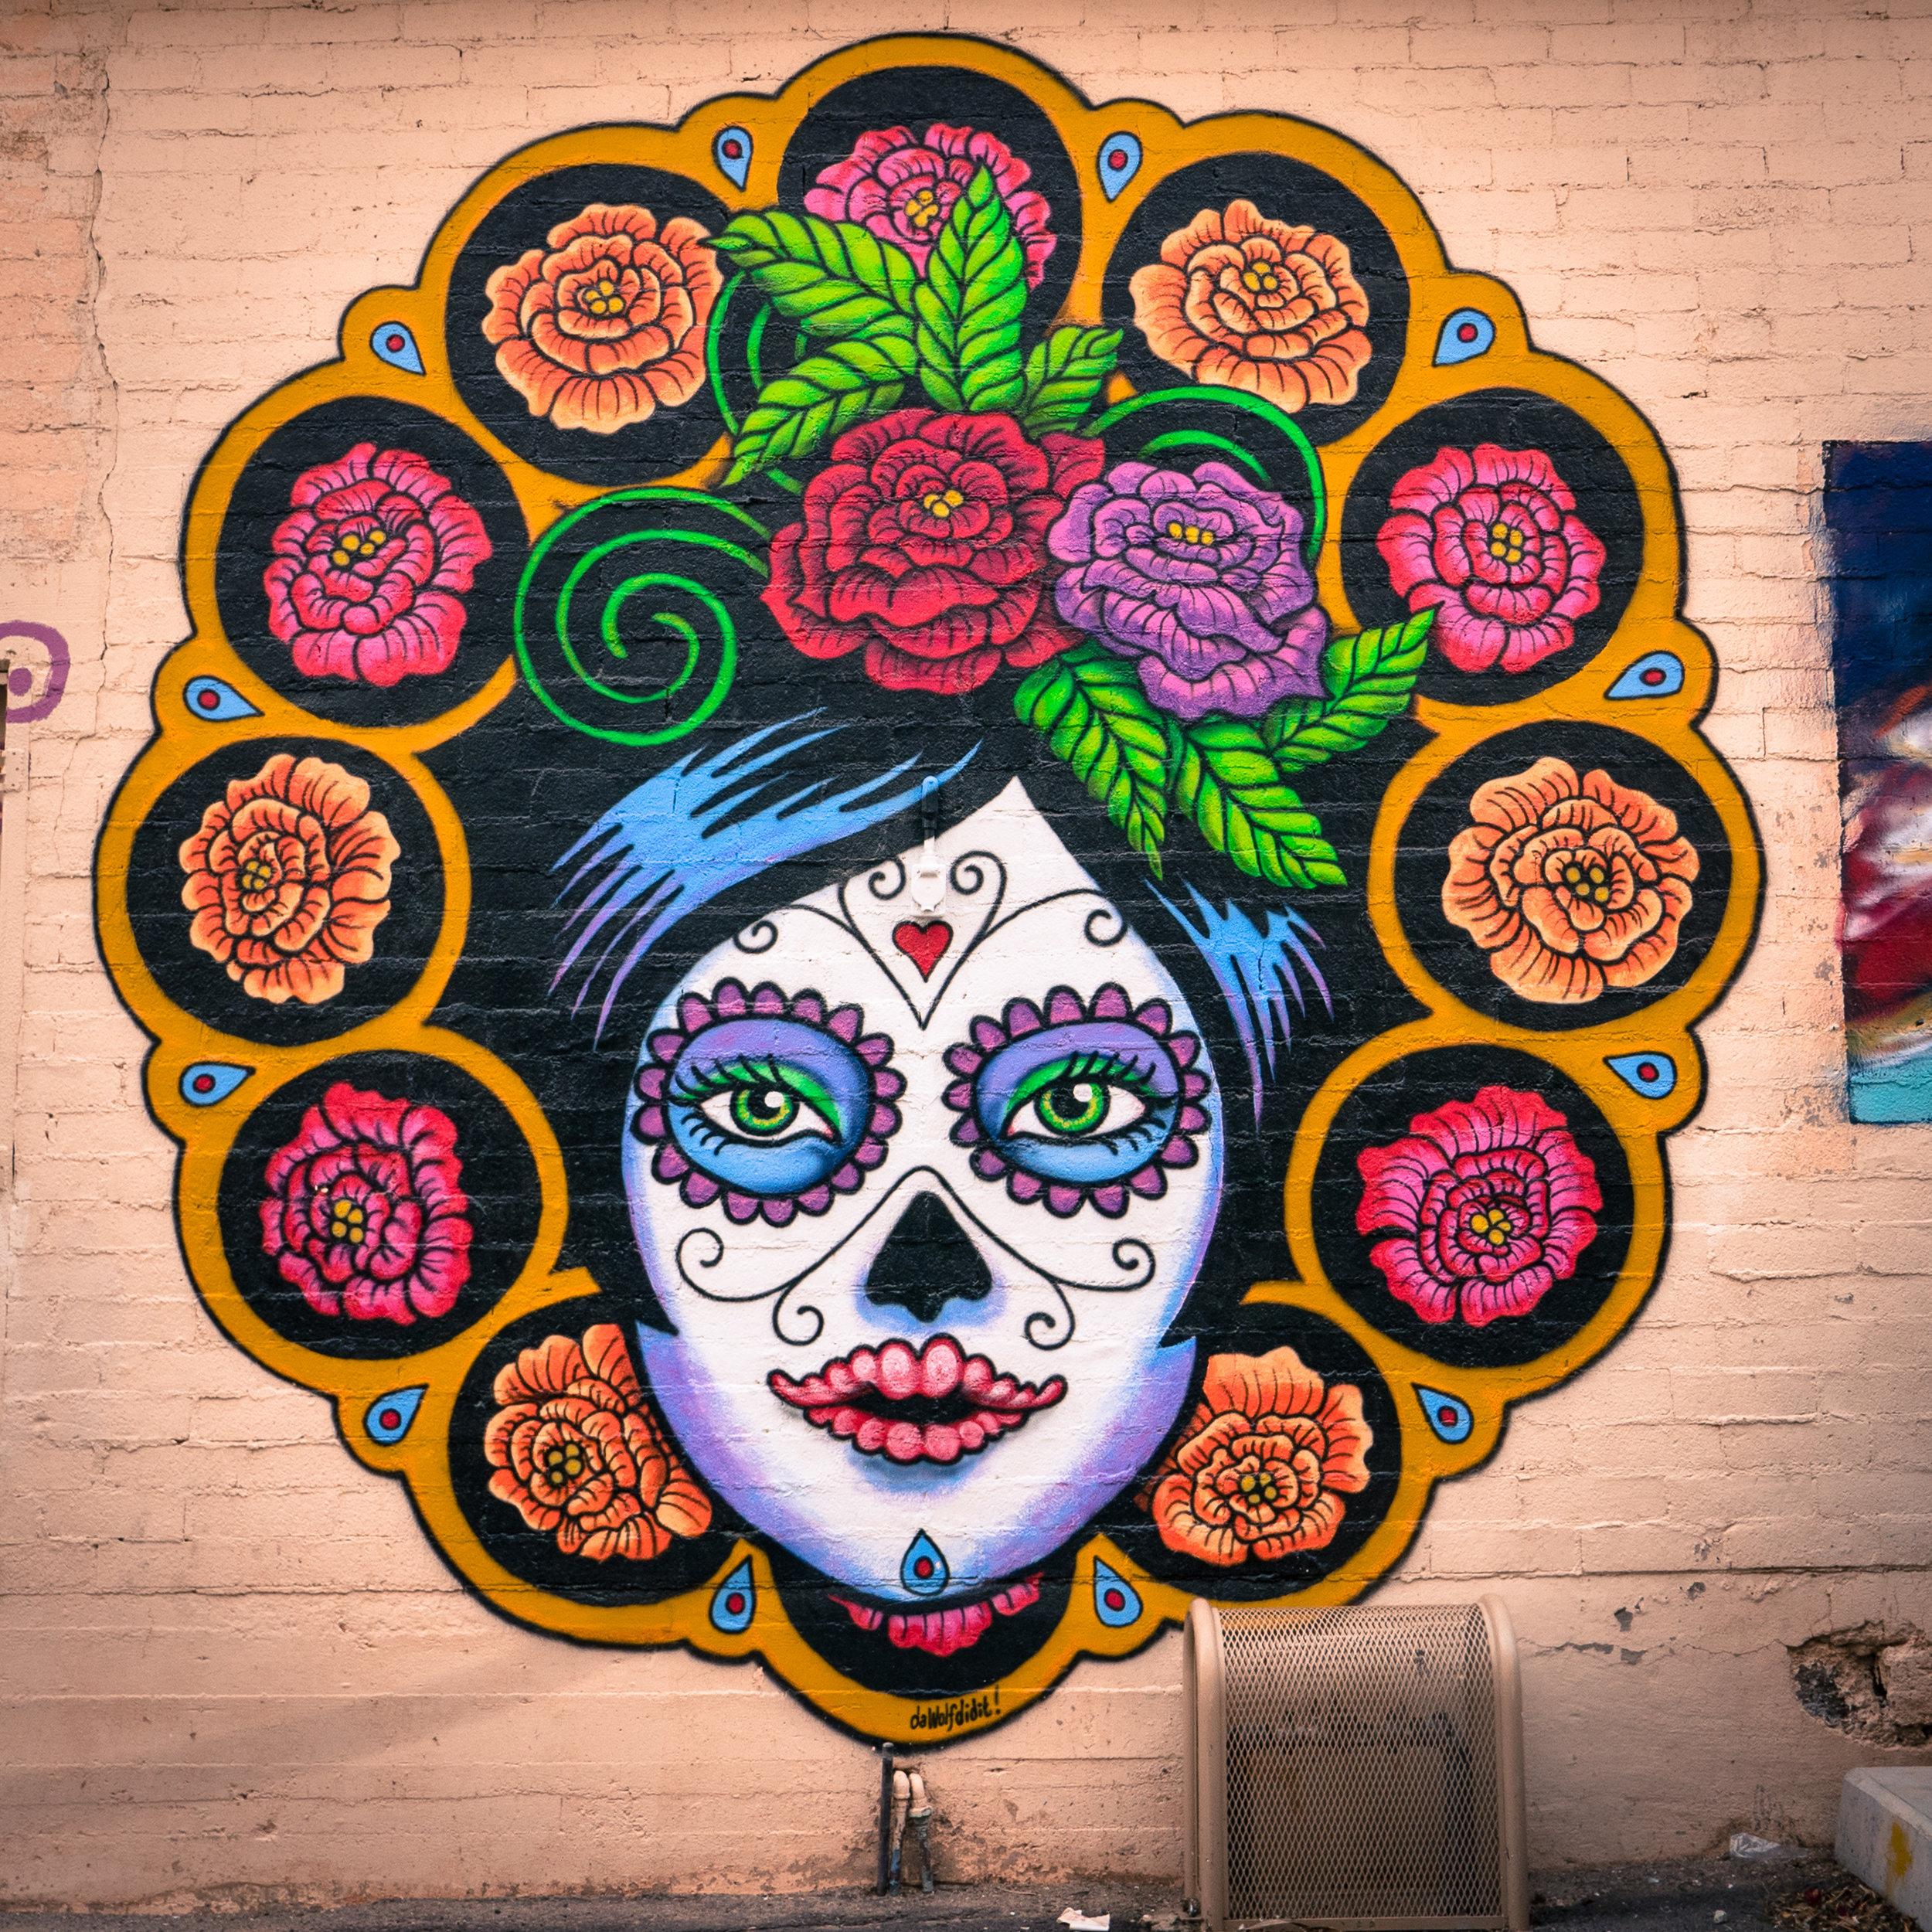 The artwork in Ajo, Arizona. Inspiring!